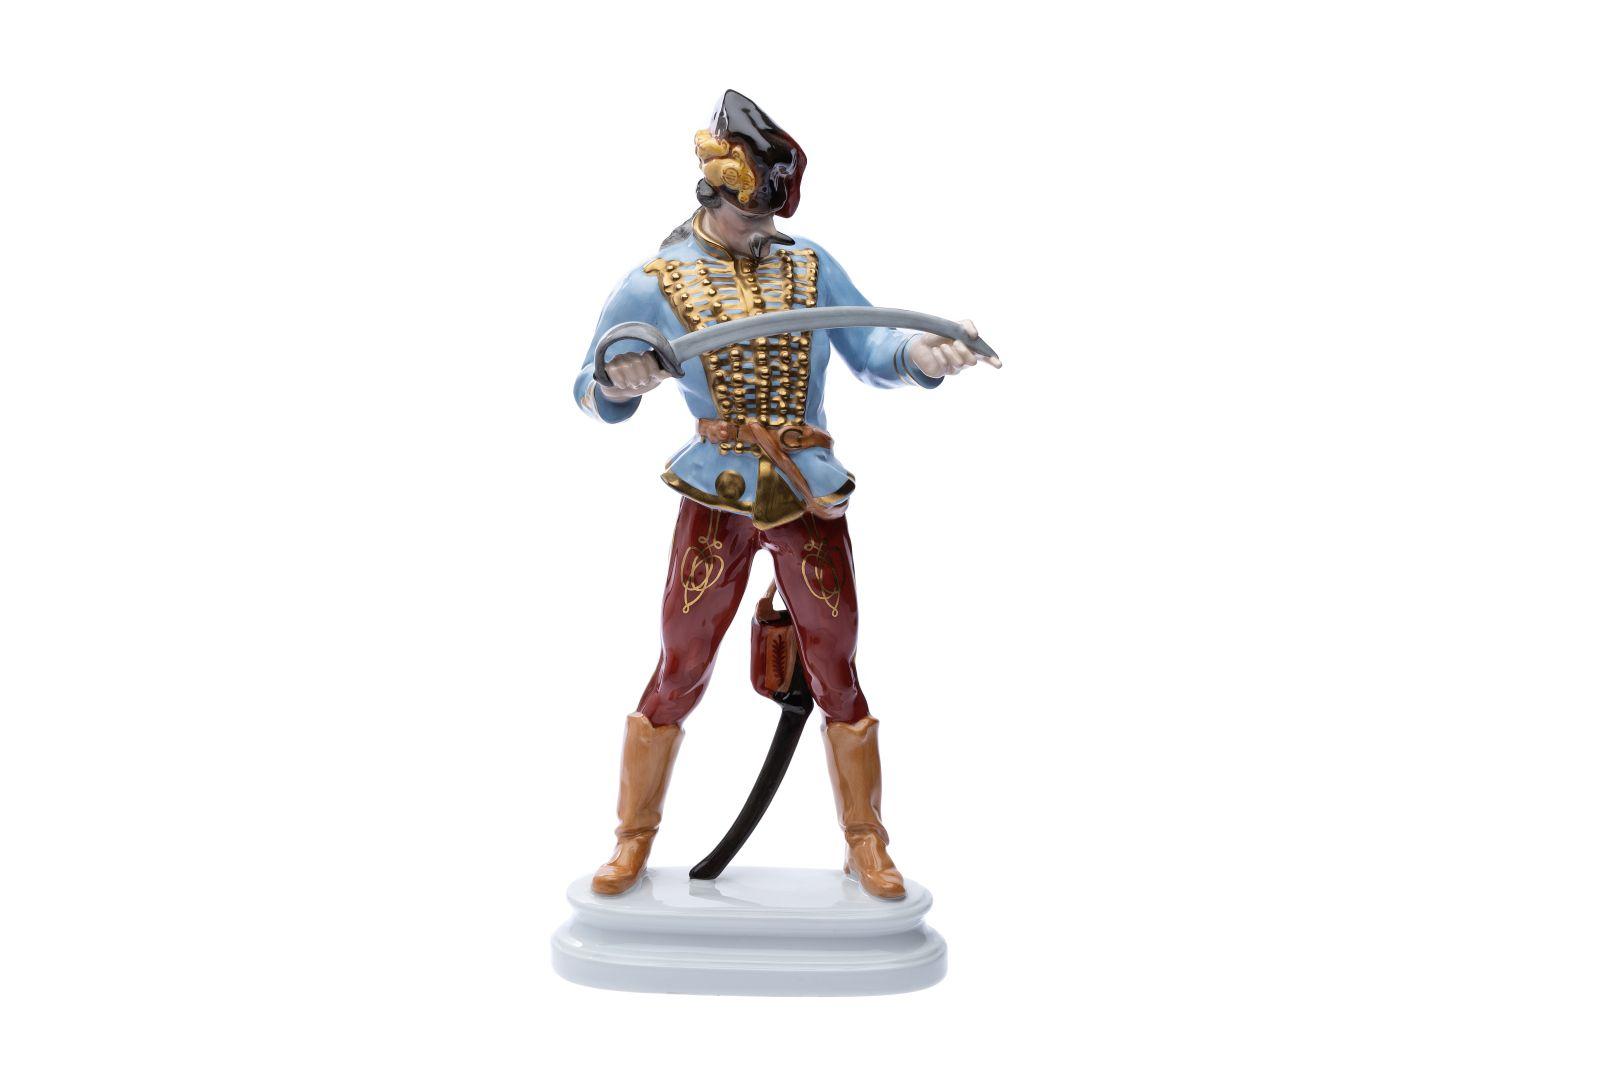 #57 Porcelain figure Image